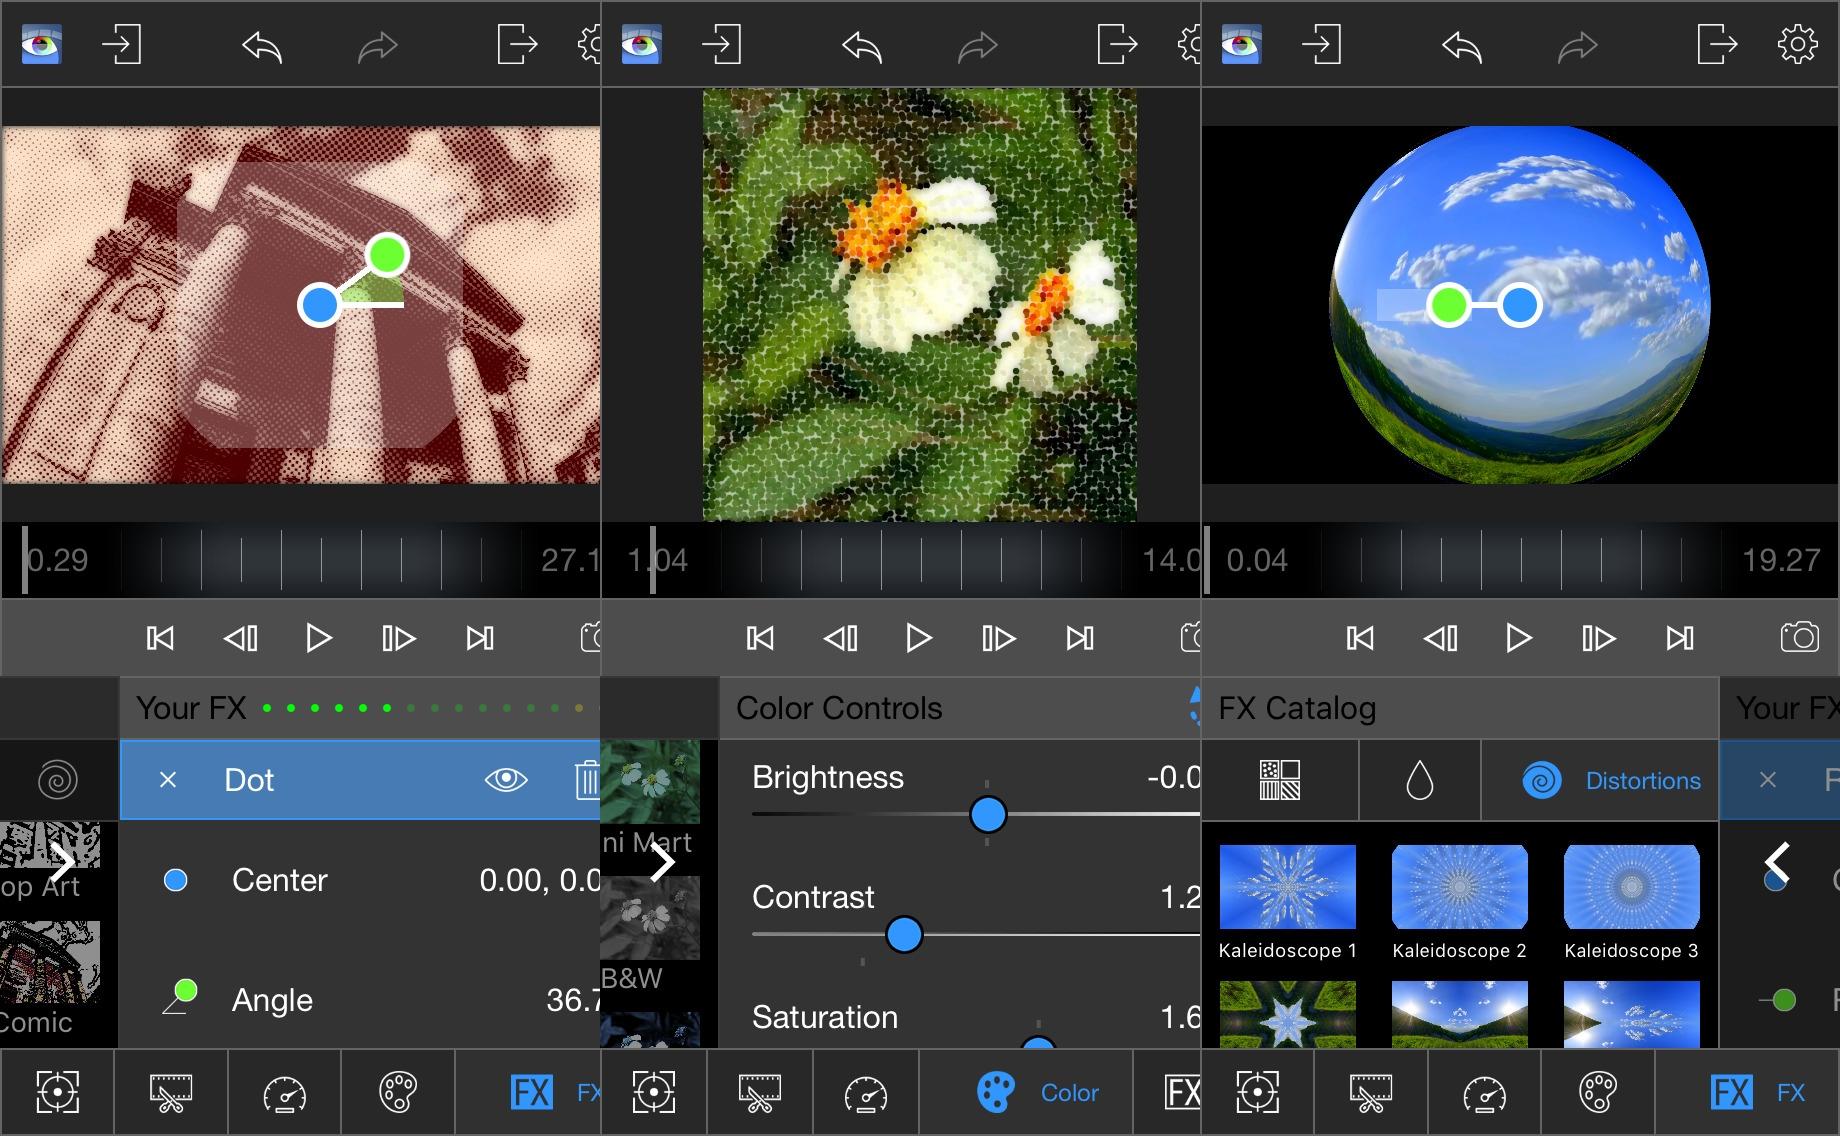 LumaFX filtre video